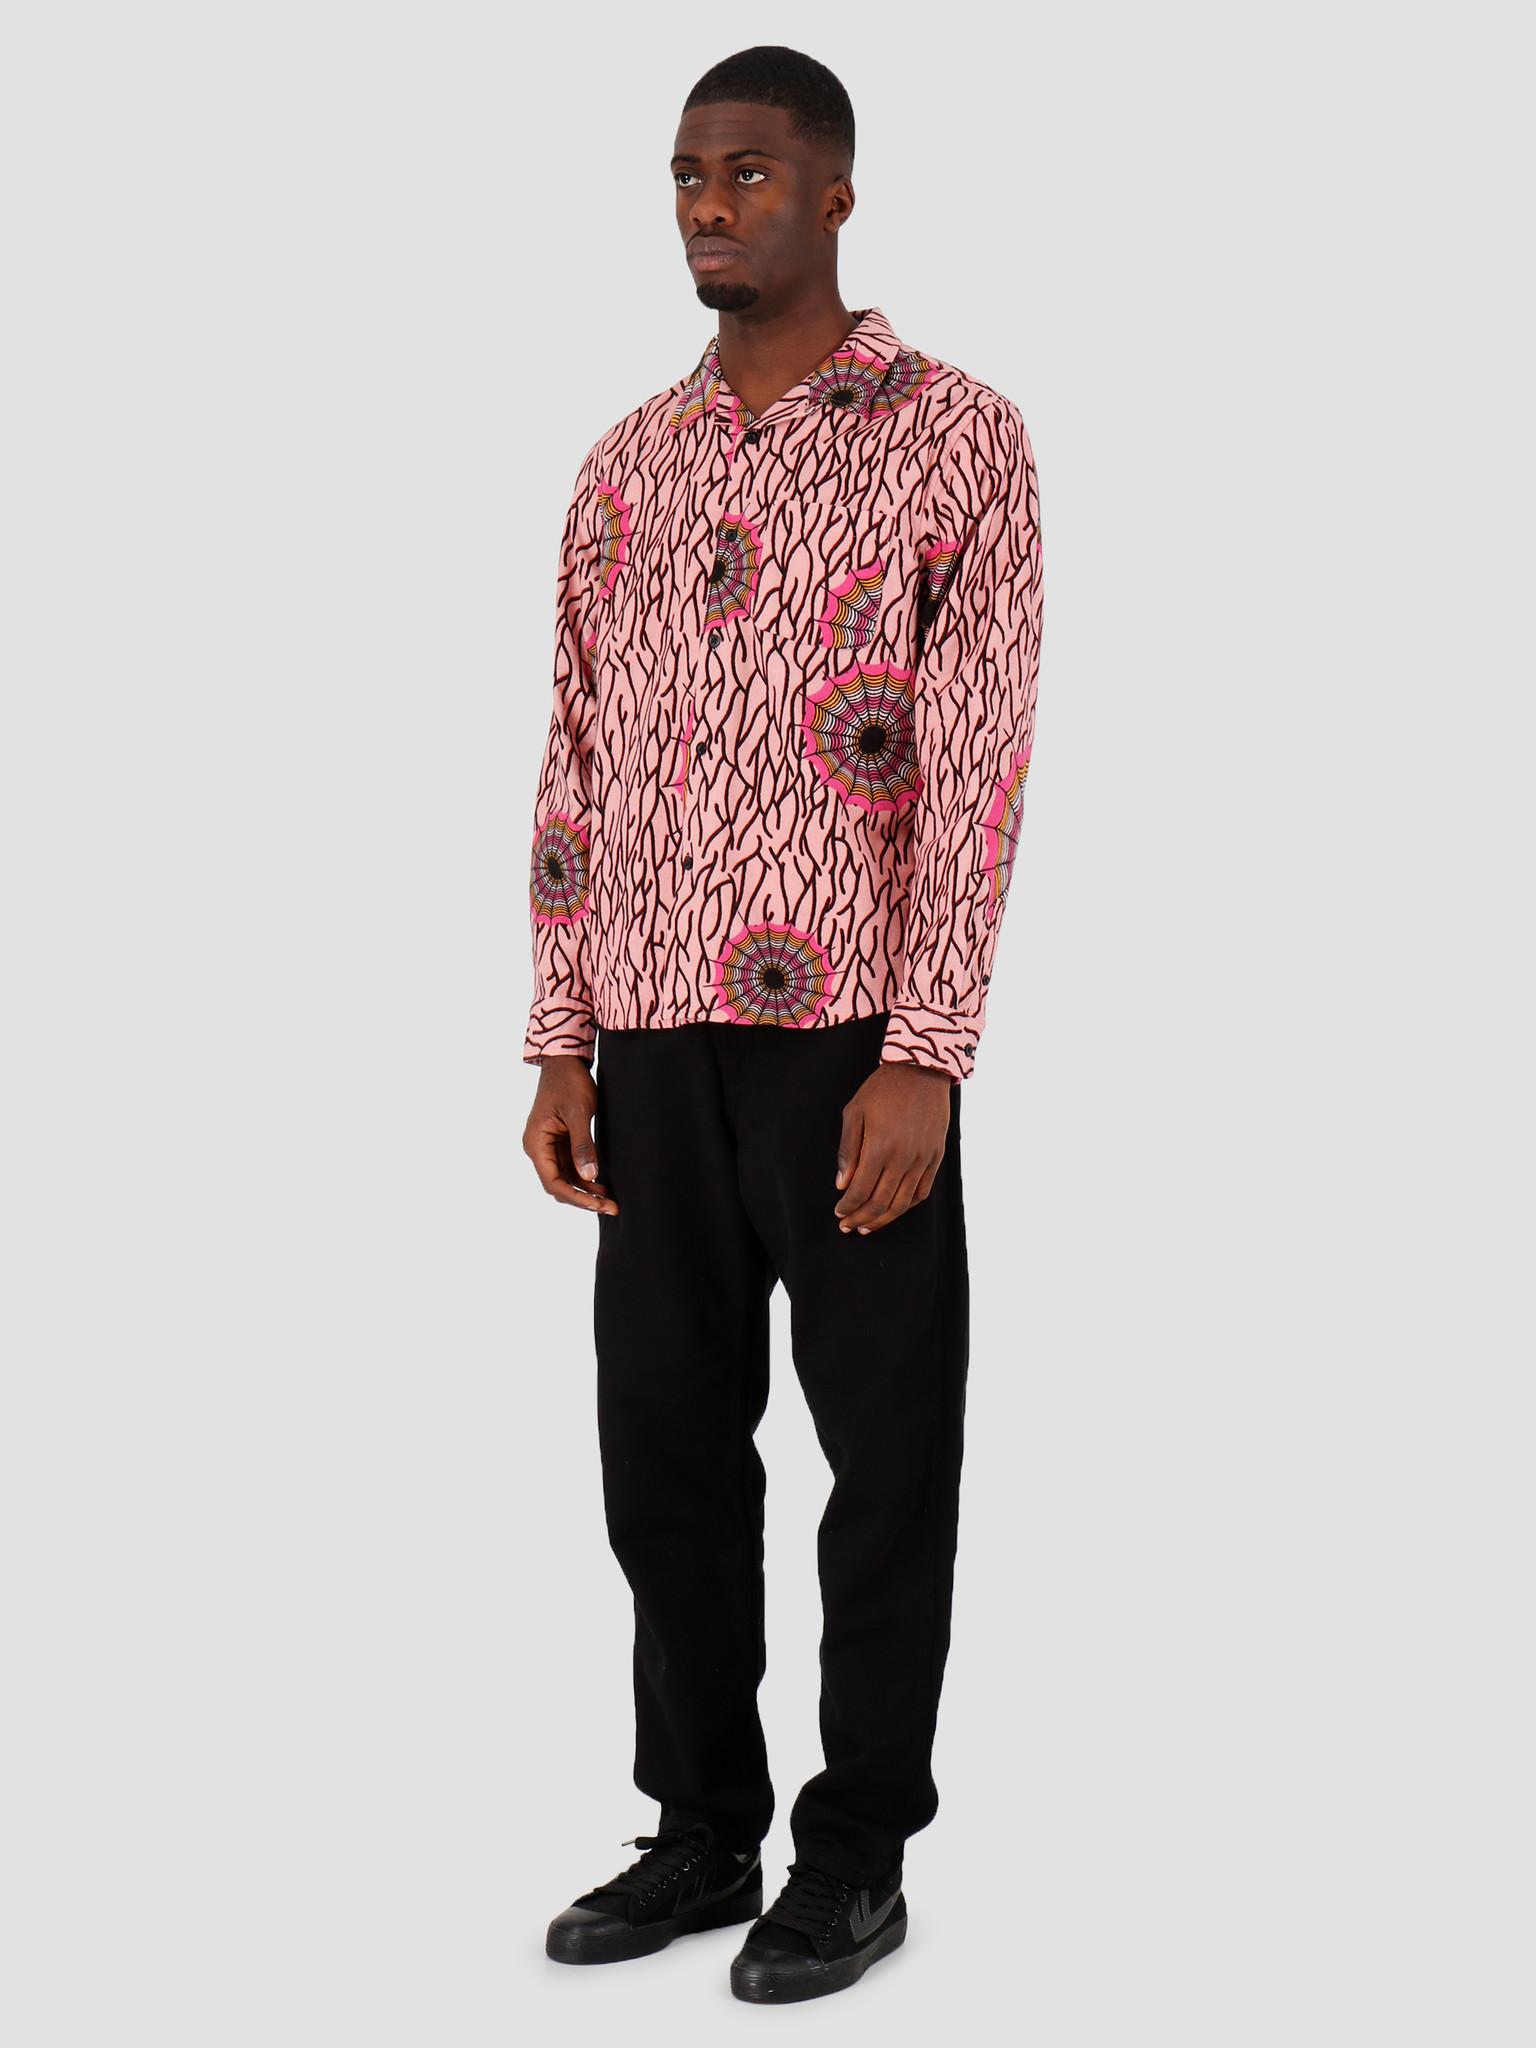 Stussy Stussy Spider Web Flannel LS Shirt Pink 1110087